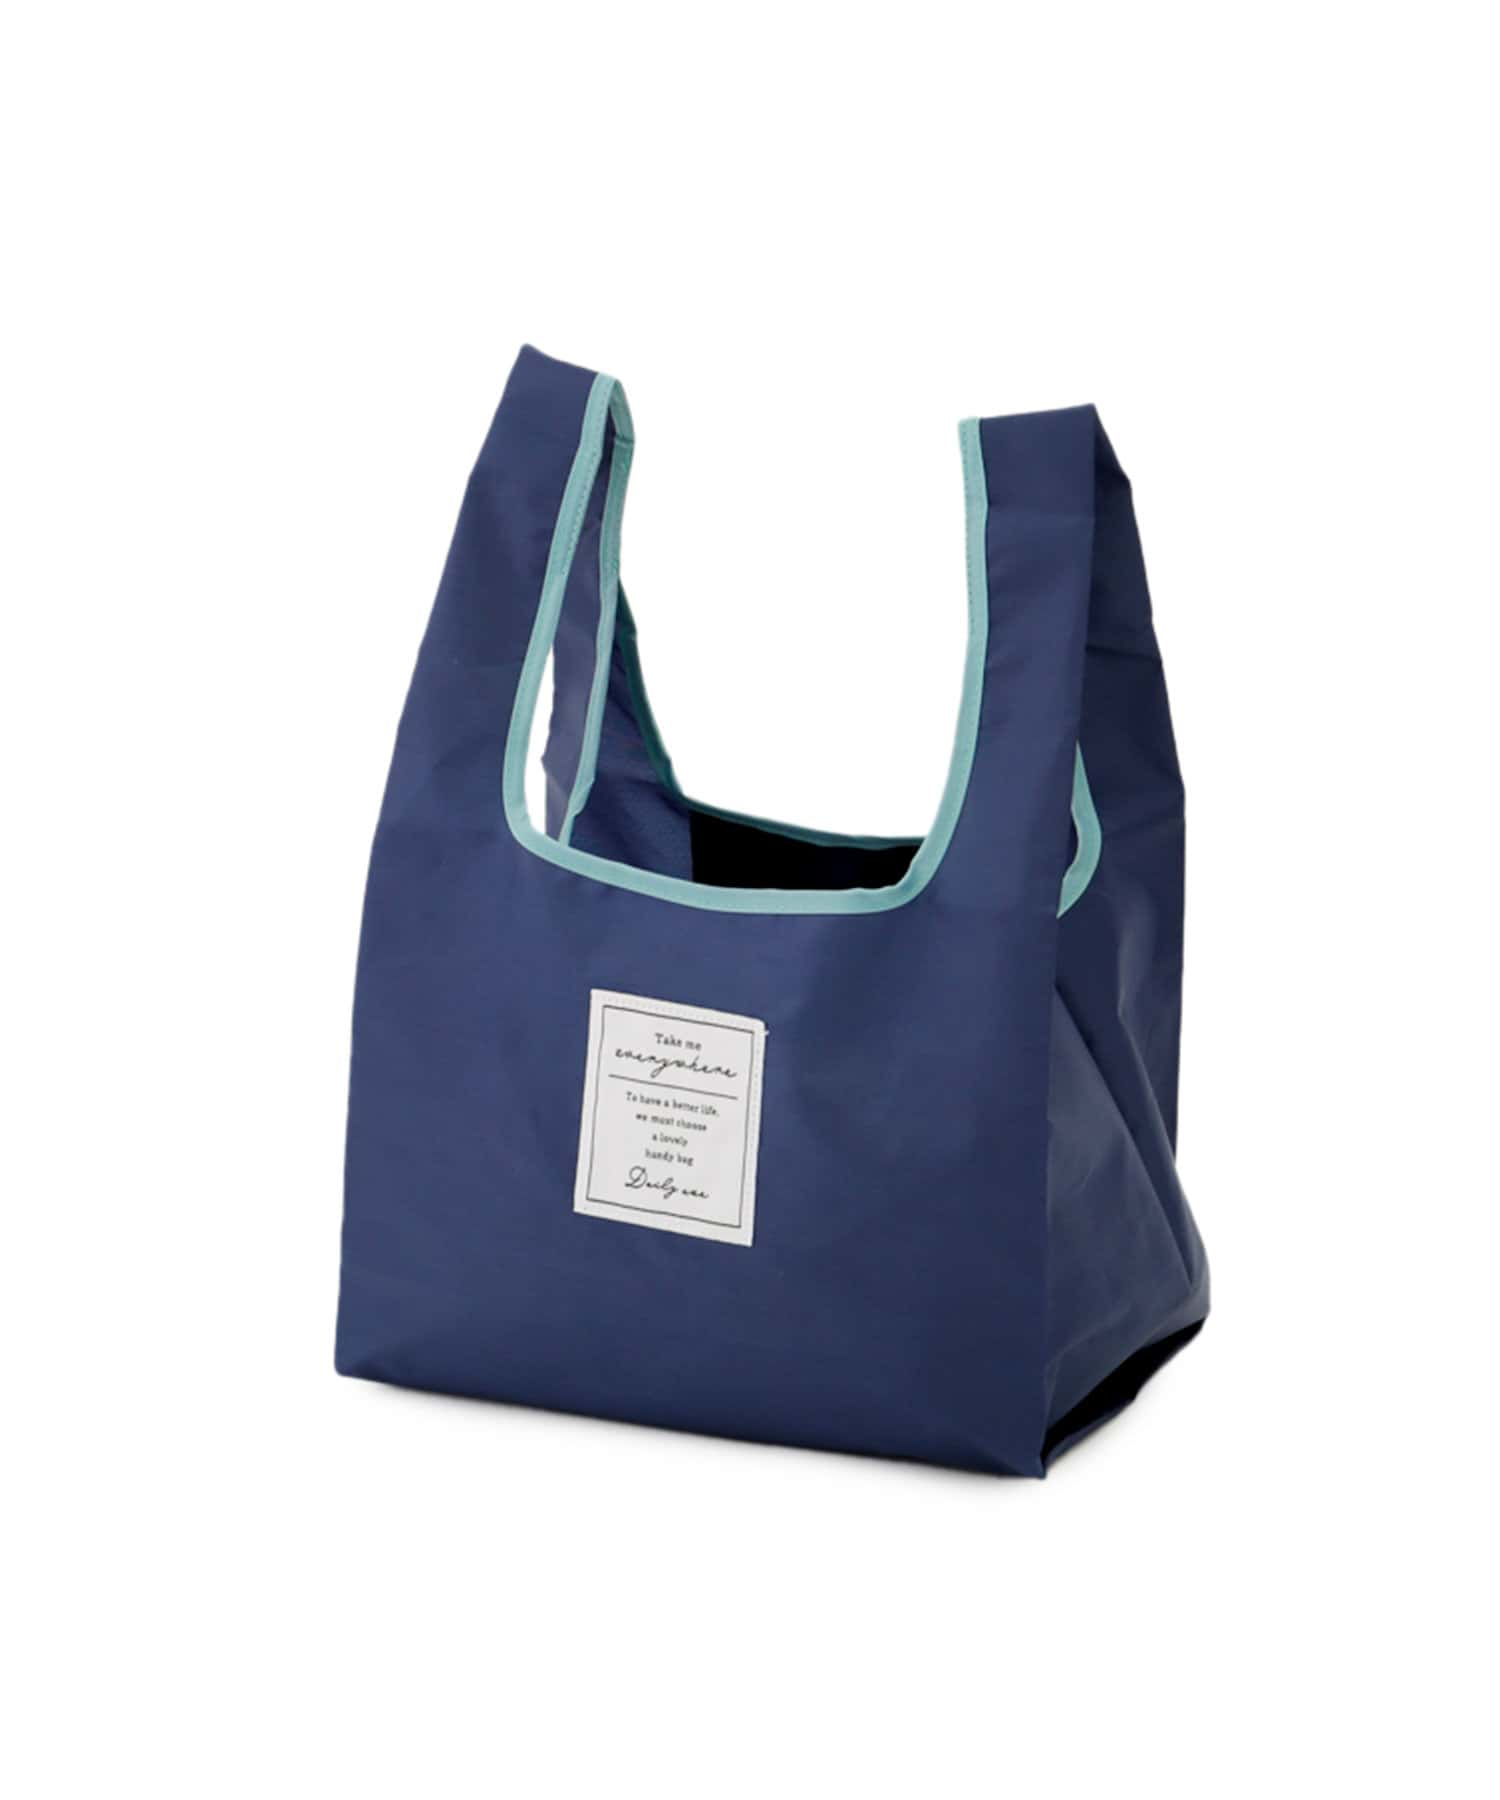 3COINS(スリーコインズ) ライフスタイル 【持ち運んでエコに使おう】お弁当バッグ ネイビー